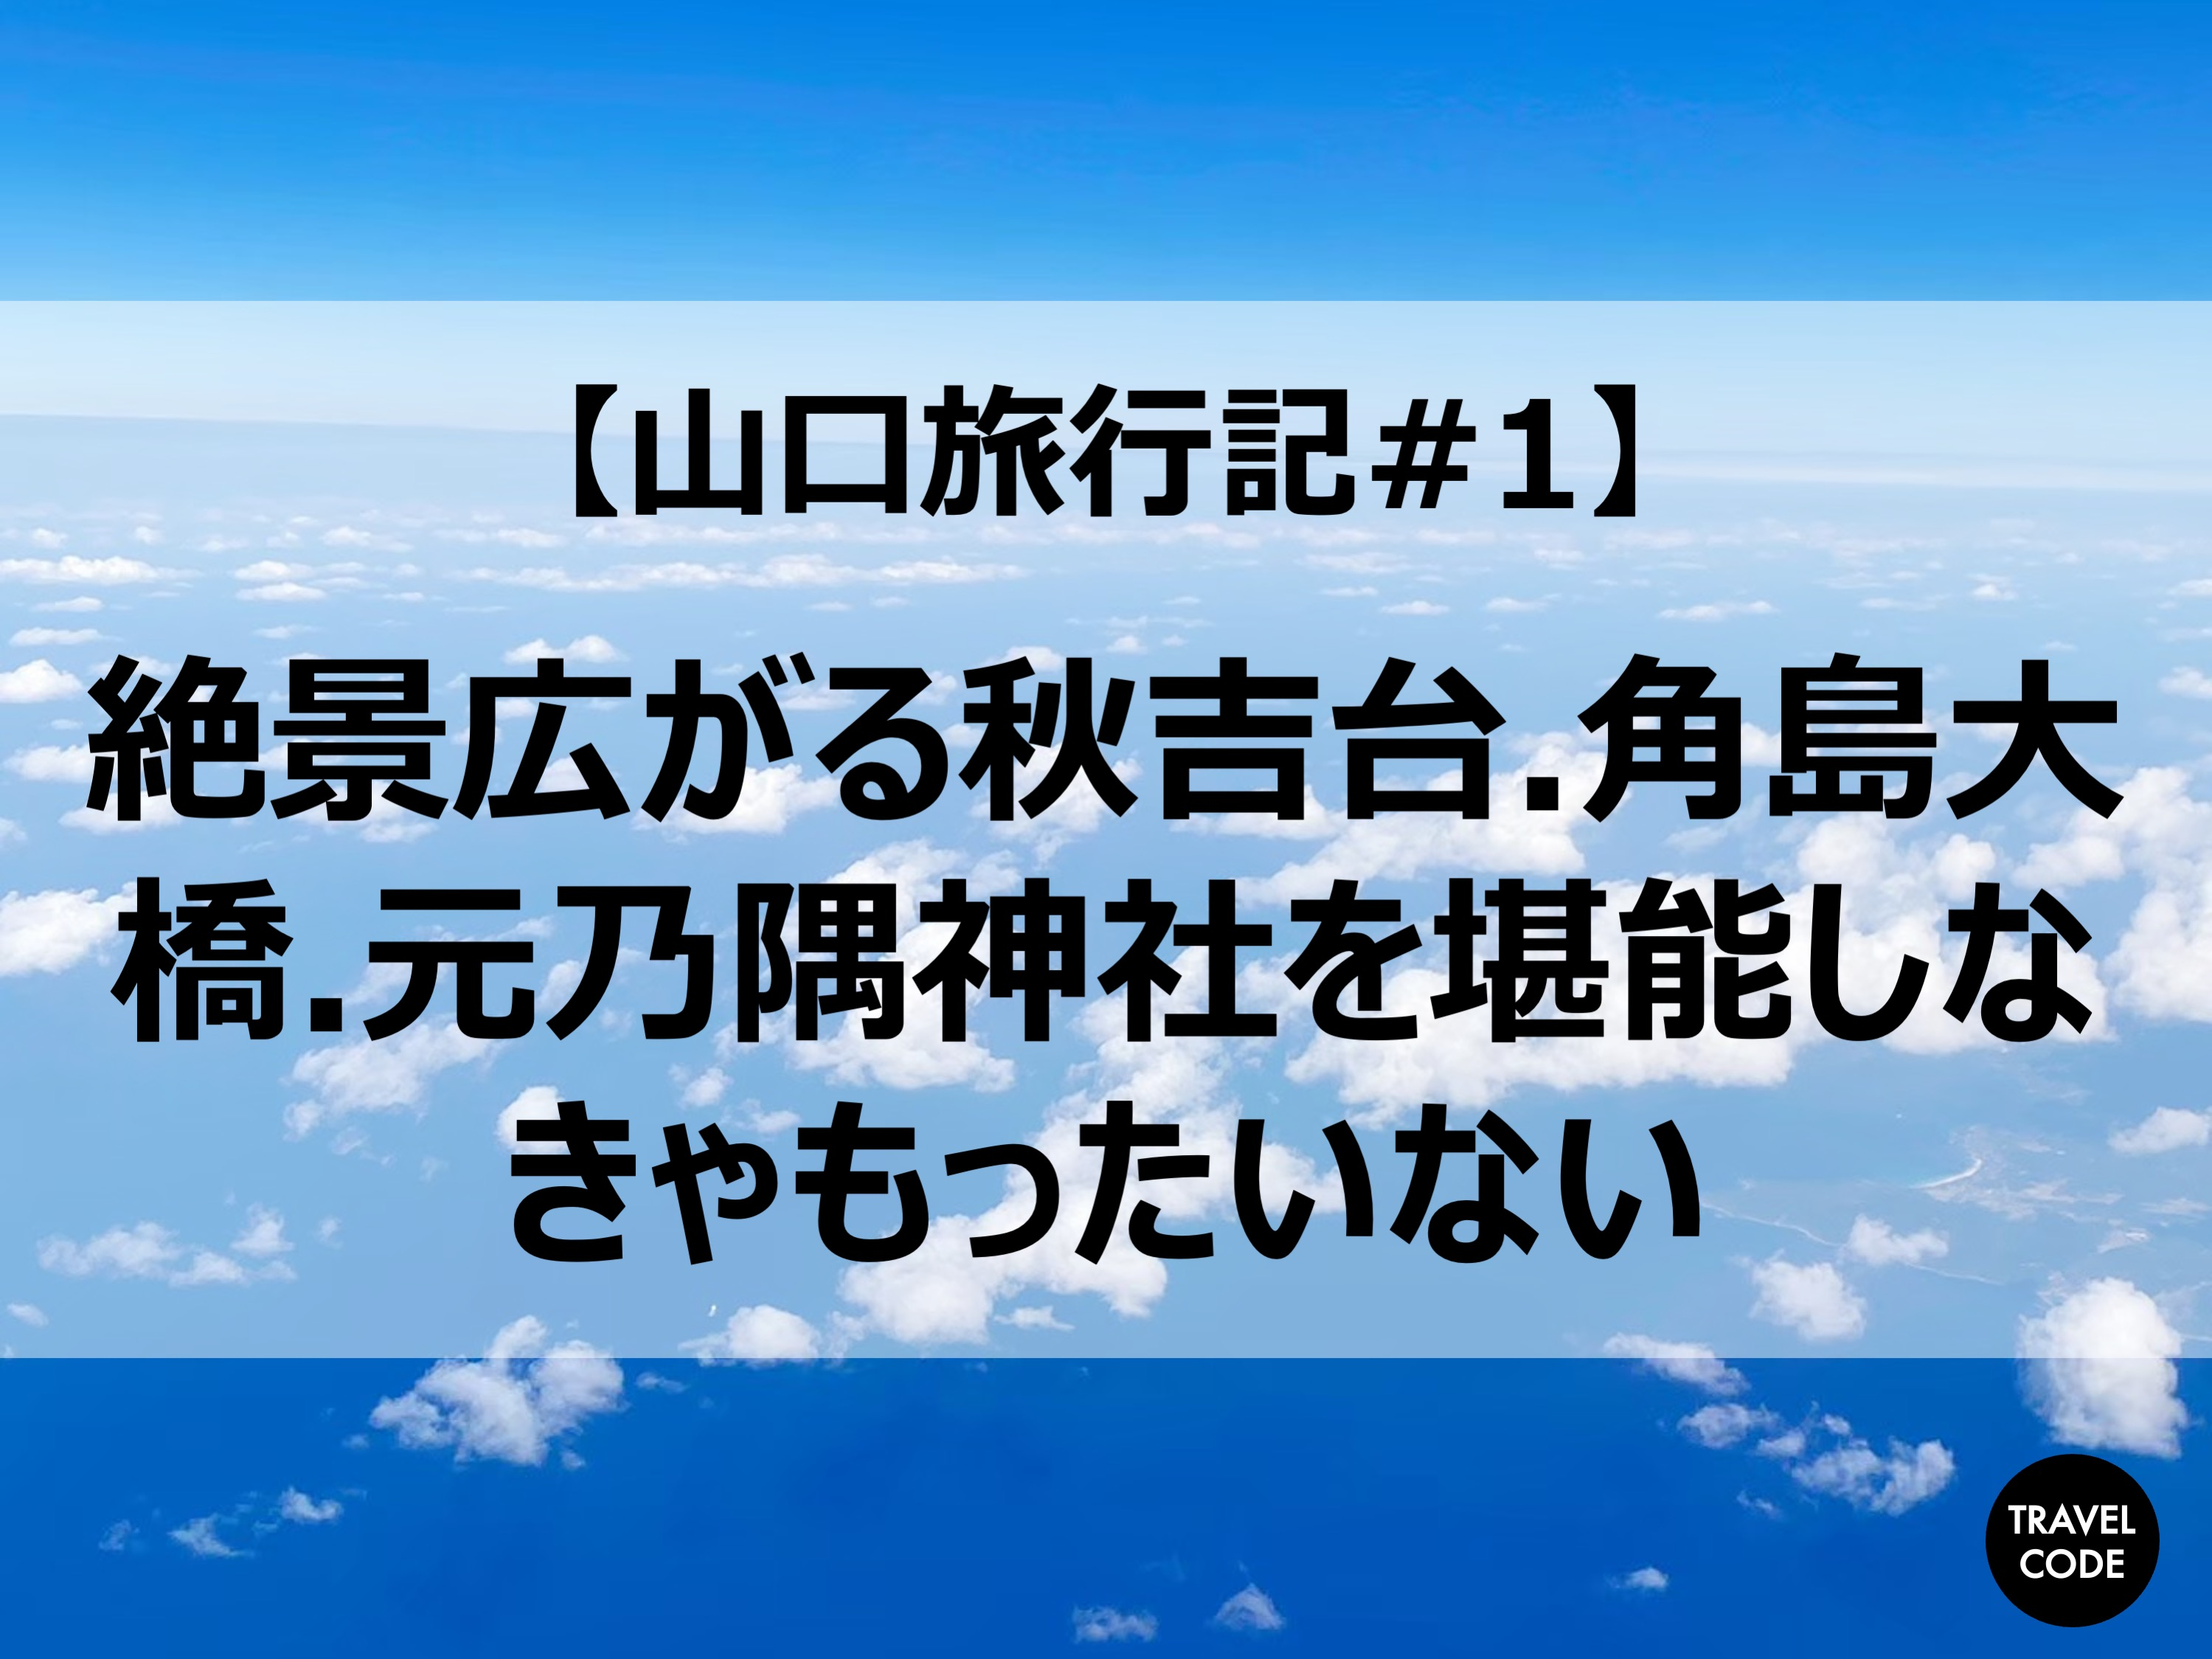 f:id:koala_log:20210909163616j:plain